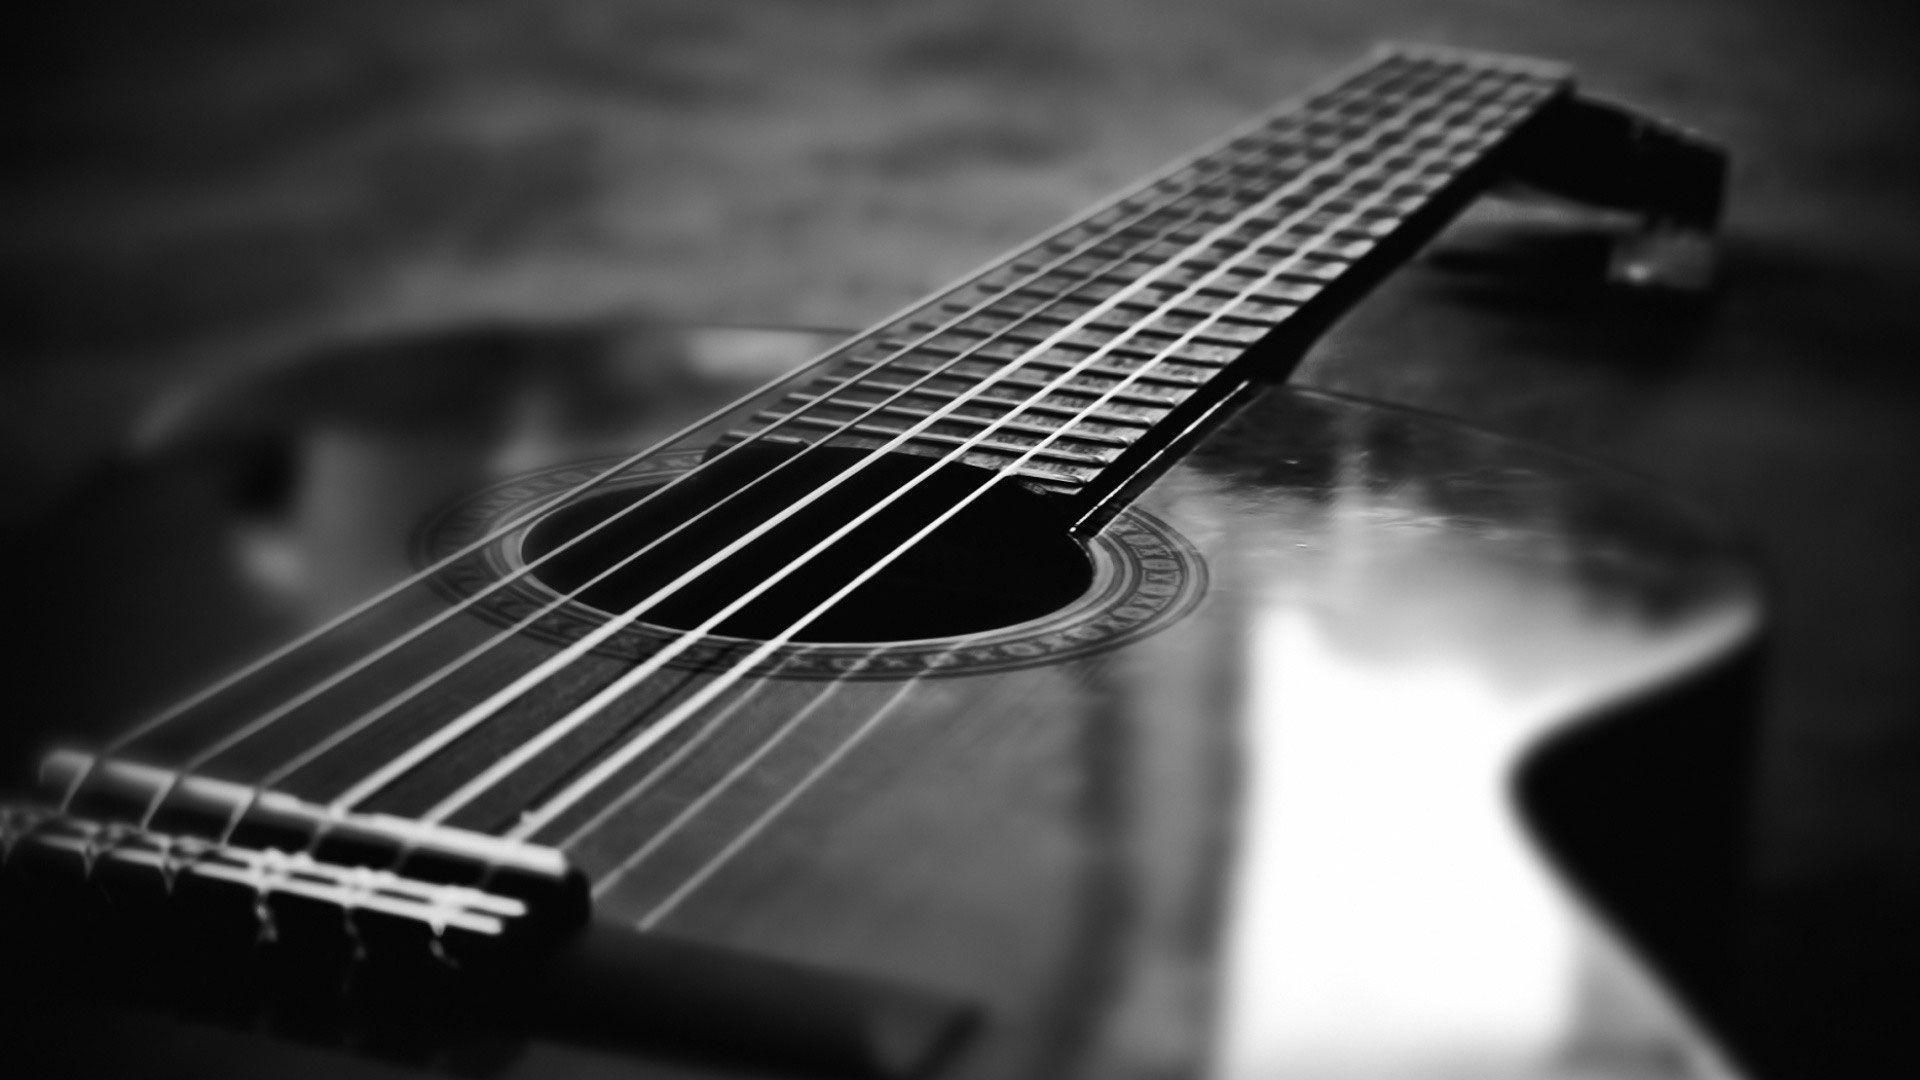 Hd Pics Photos Best Guitar Beautiful Macro Music Instruments Quality Desktop Background Wallpaper